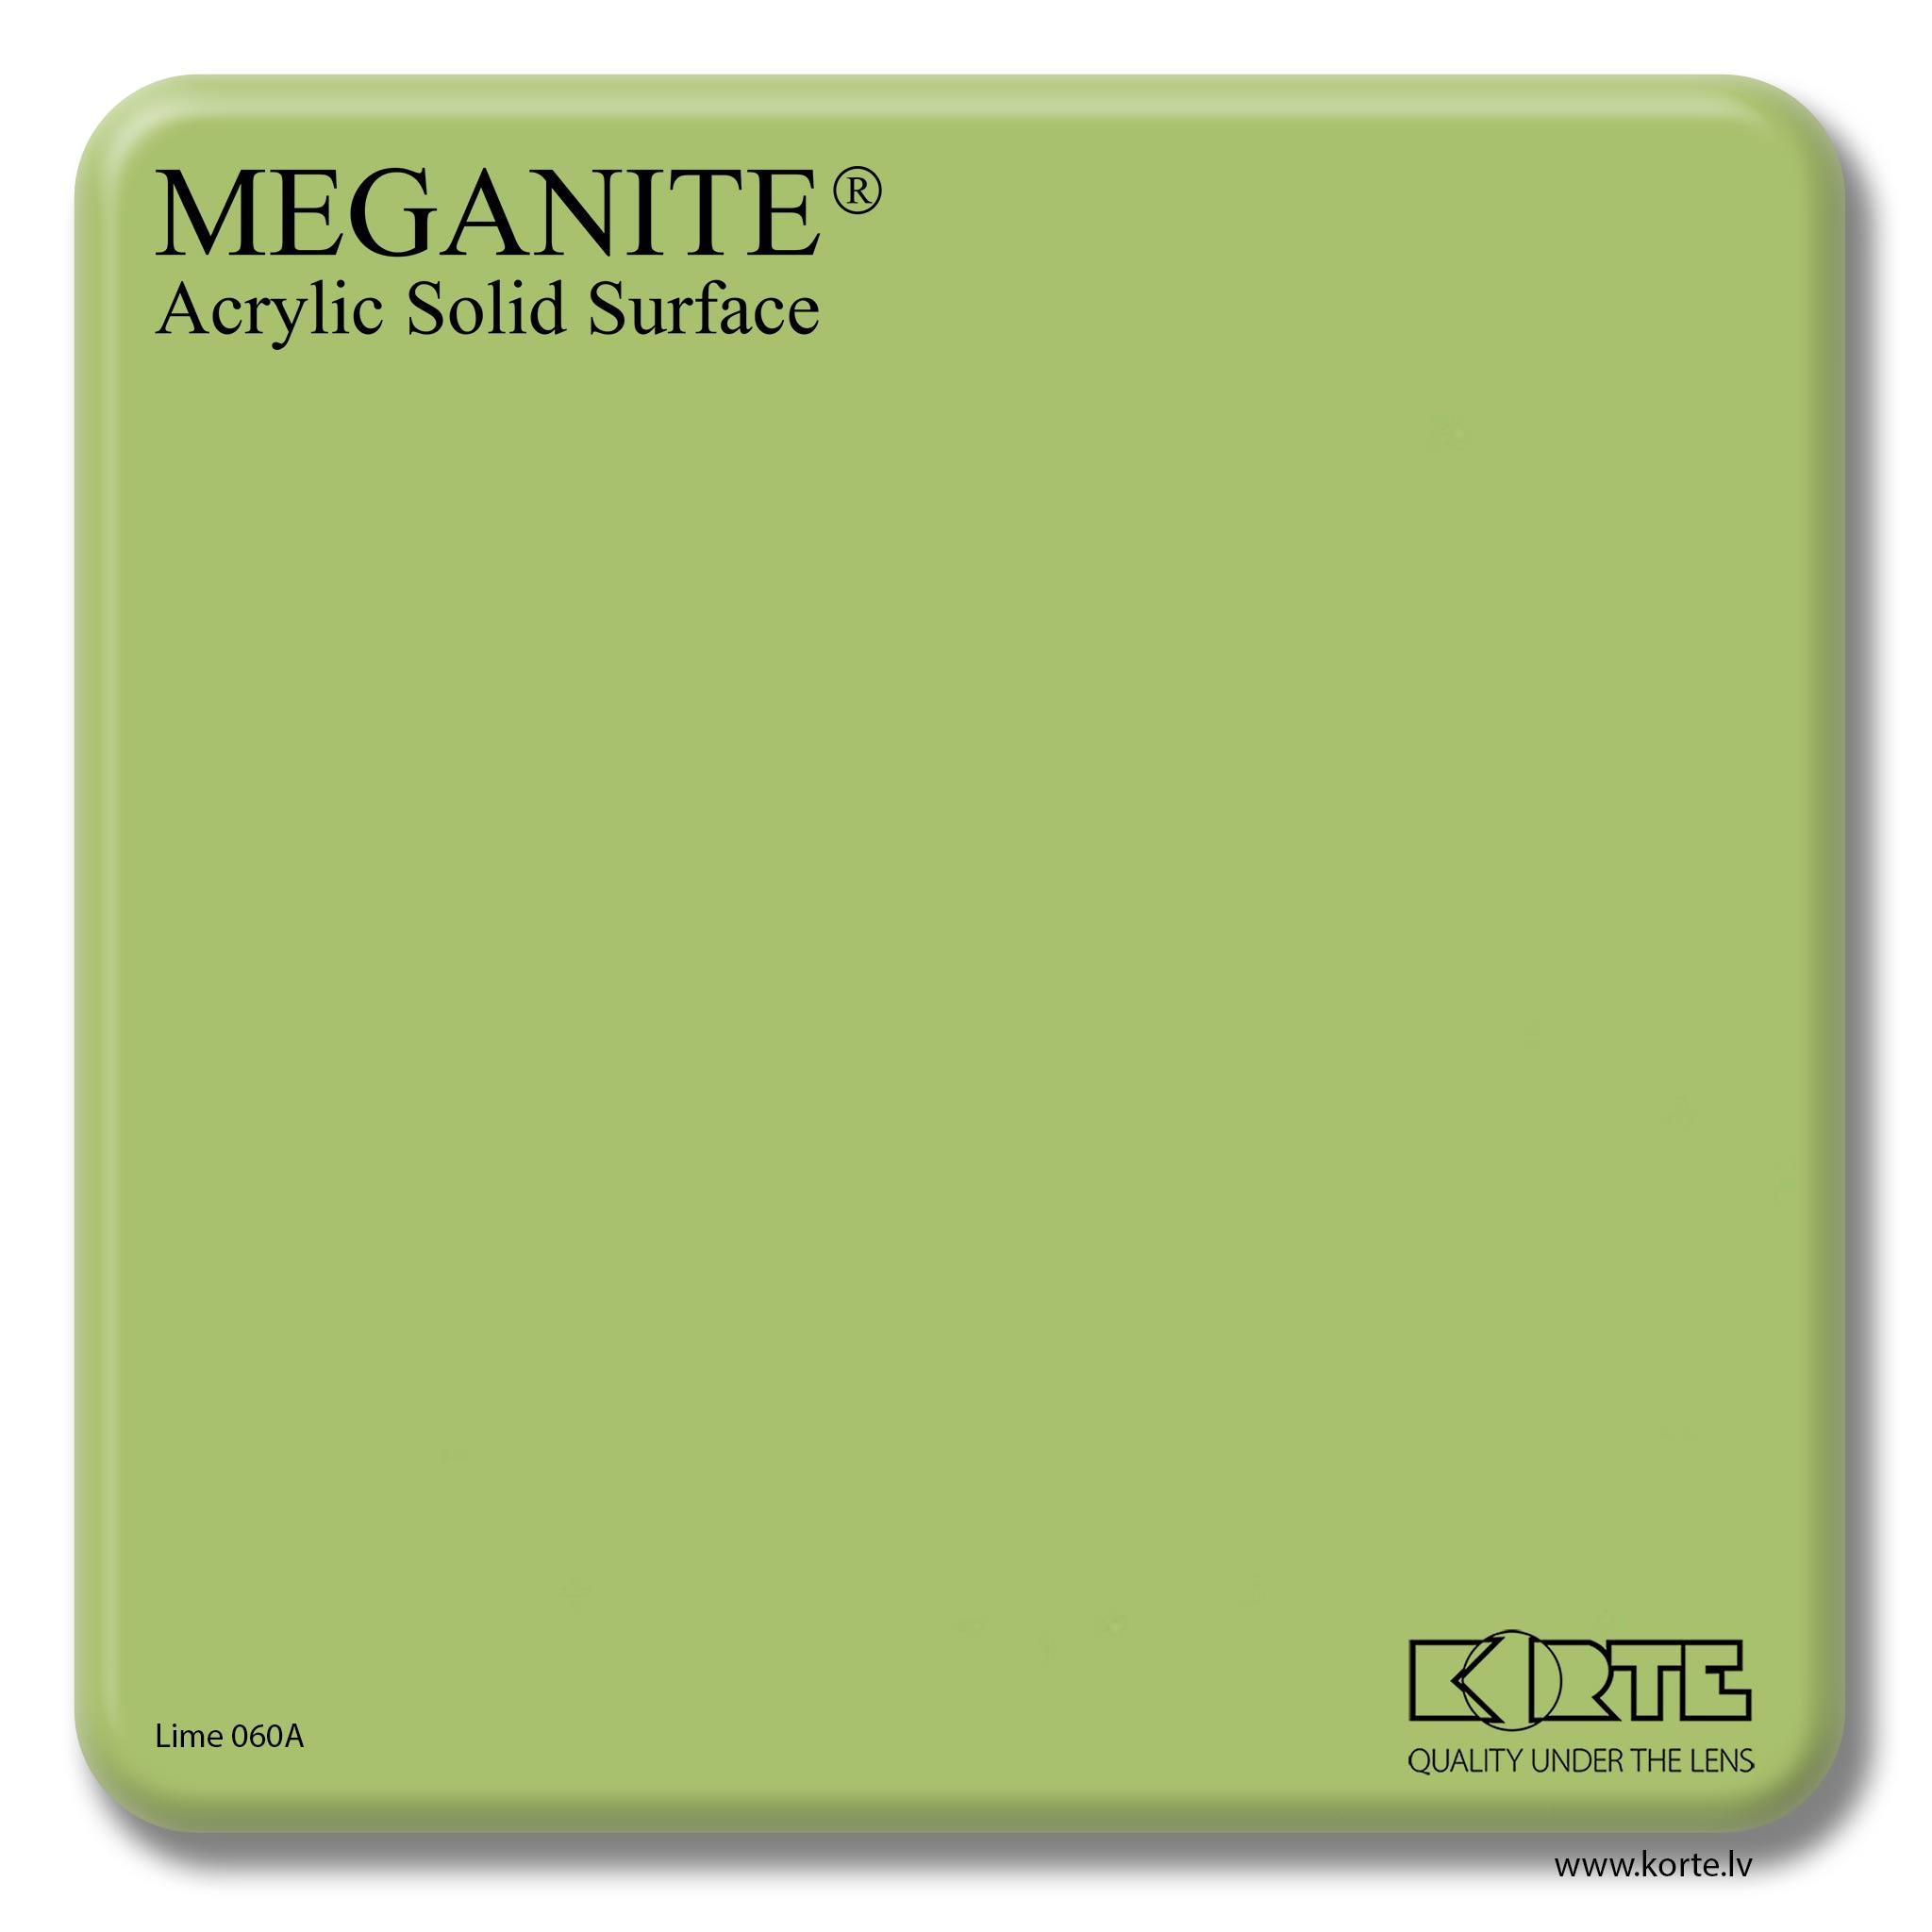 Meganite Lime 060A